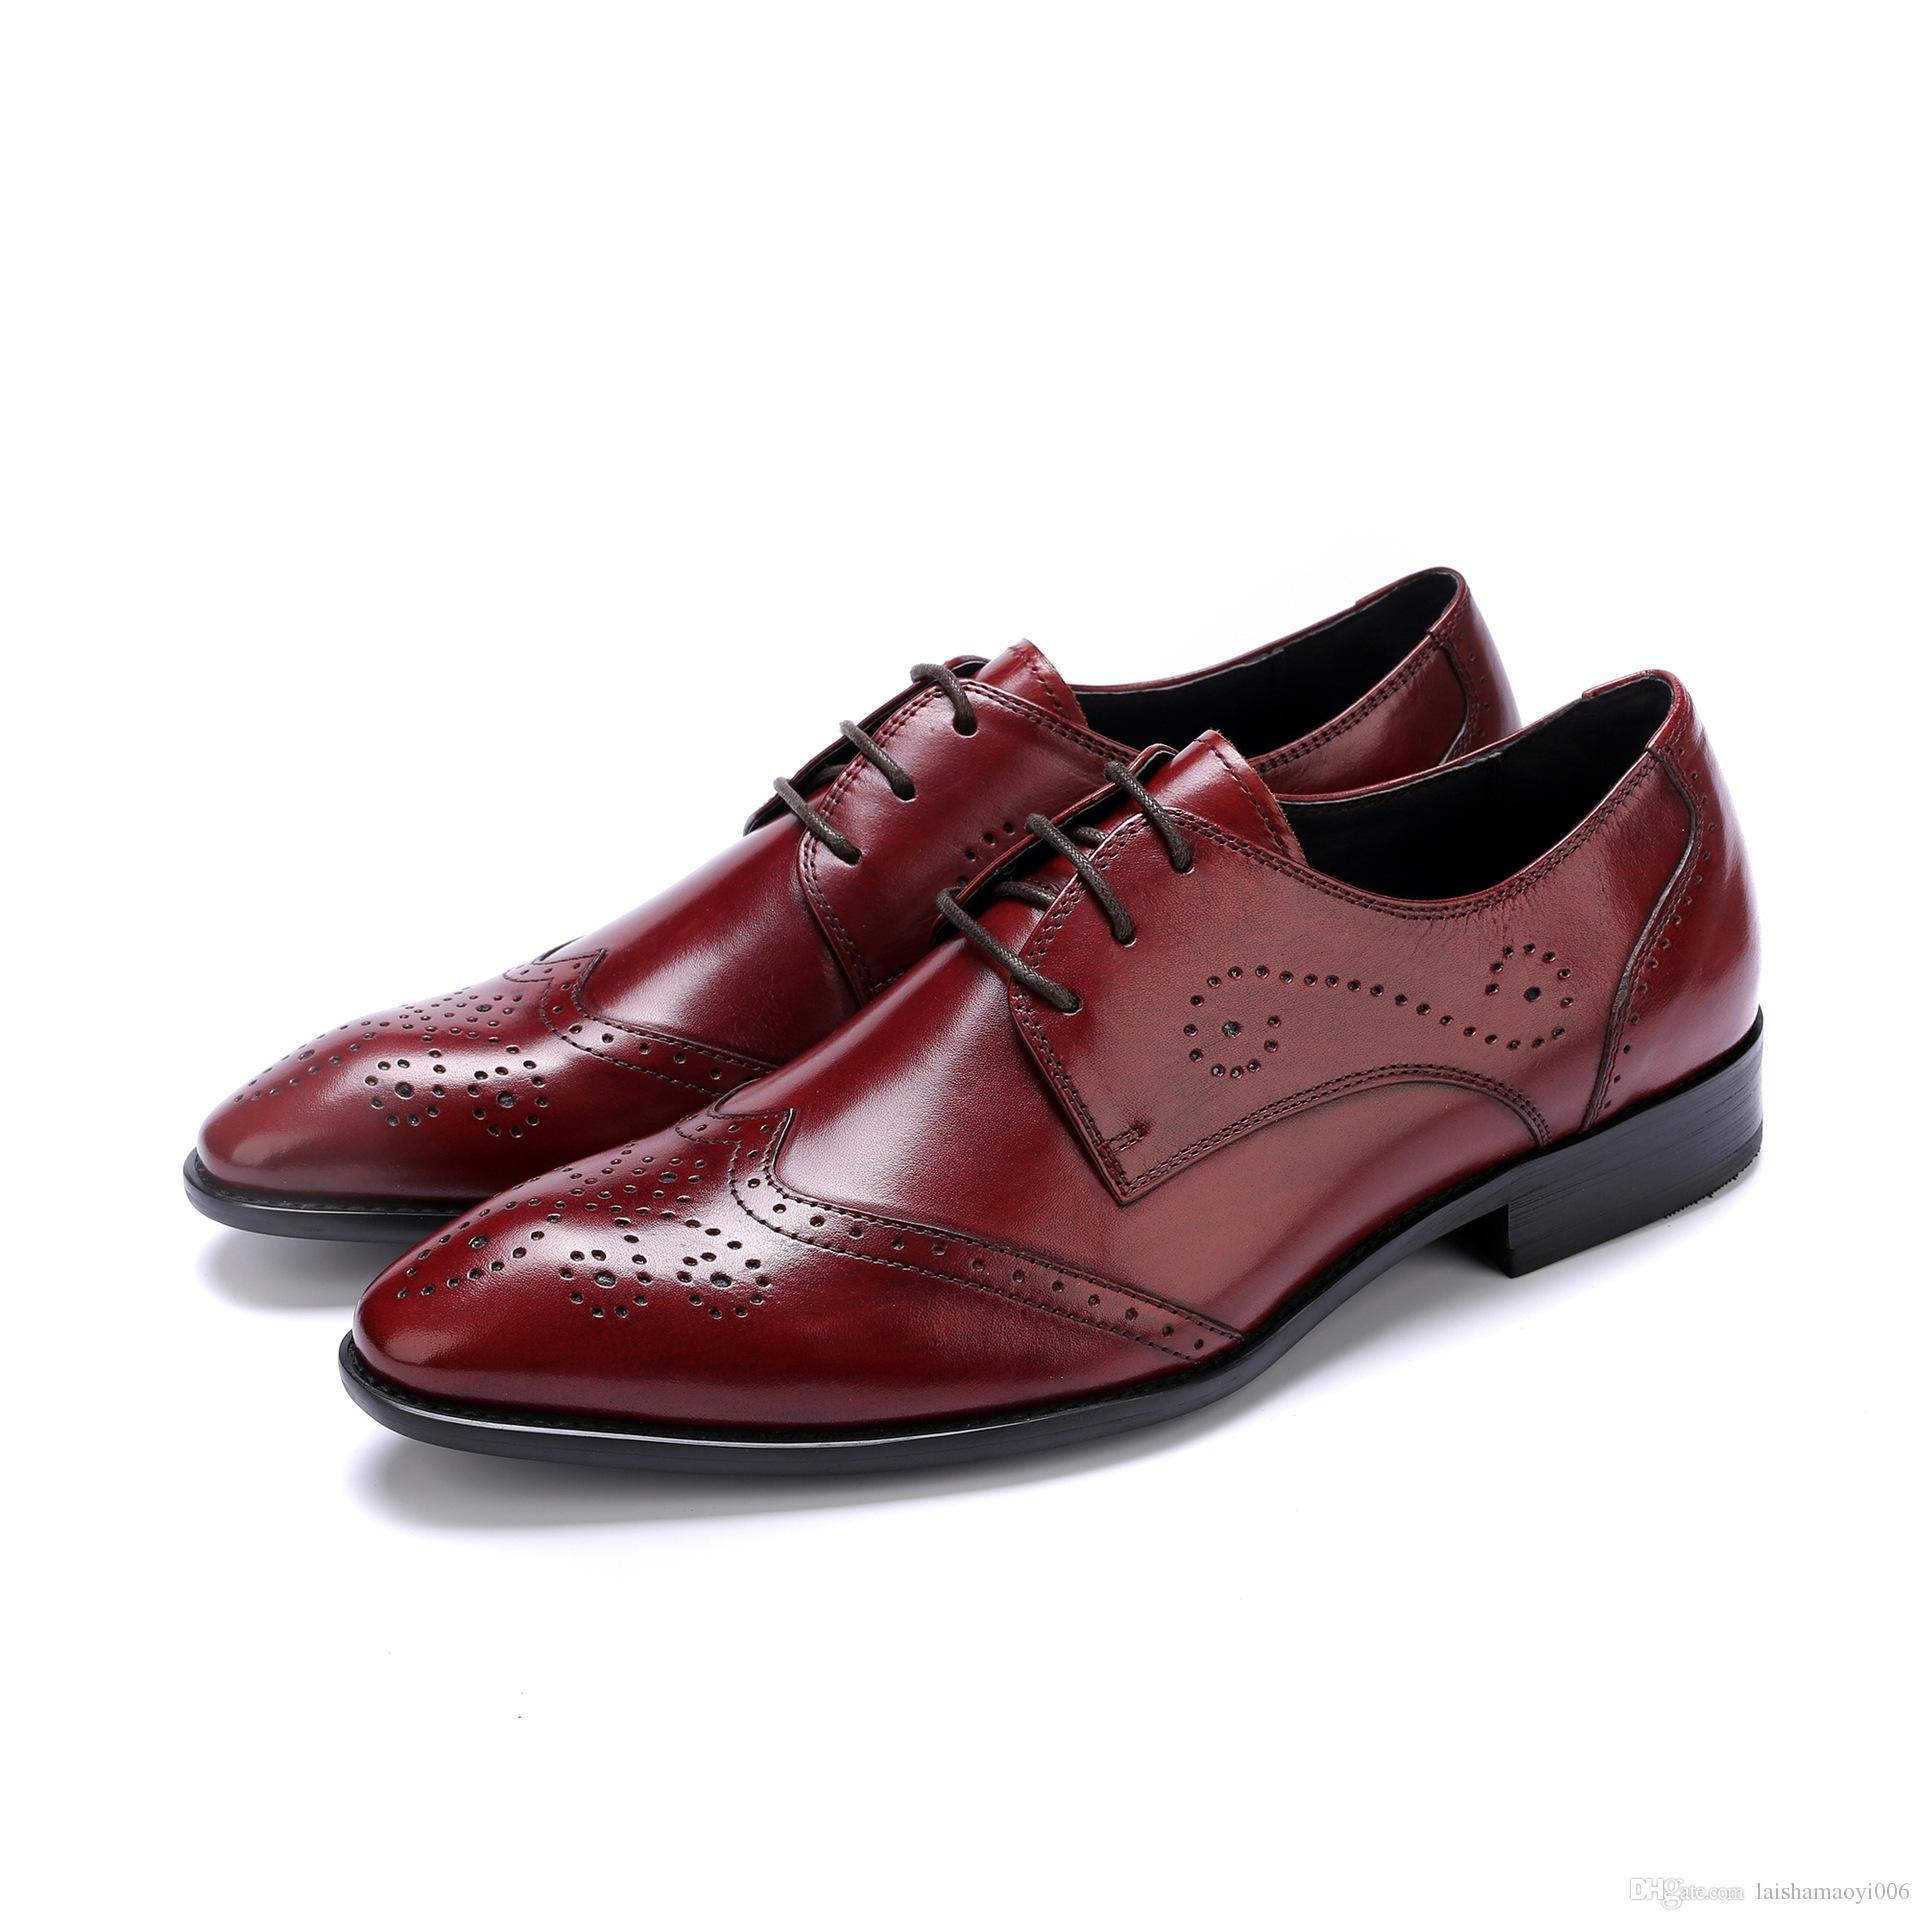 49faf759923 Cheap But Good Dress Shoes | Saddha